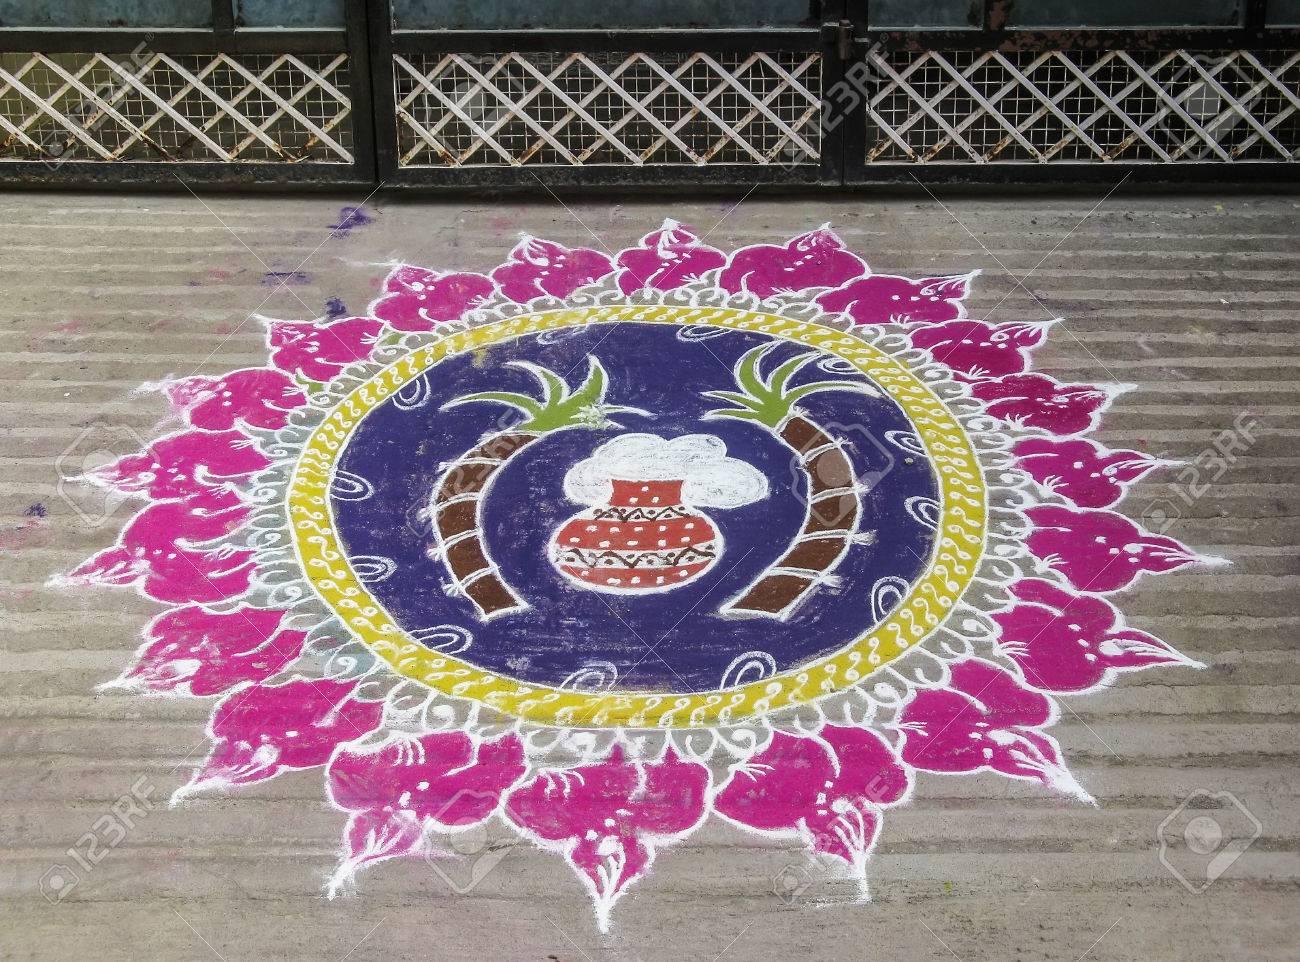 Colorful figure-prayer painted around the front door. Festival rangoli. India Stock Photo & Colorful Figure-prayer Painted Around The Front Door. Festival ...